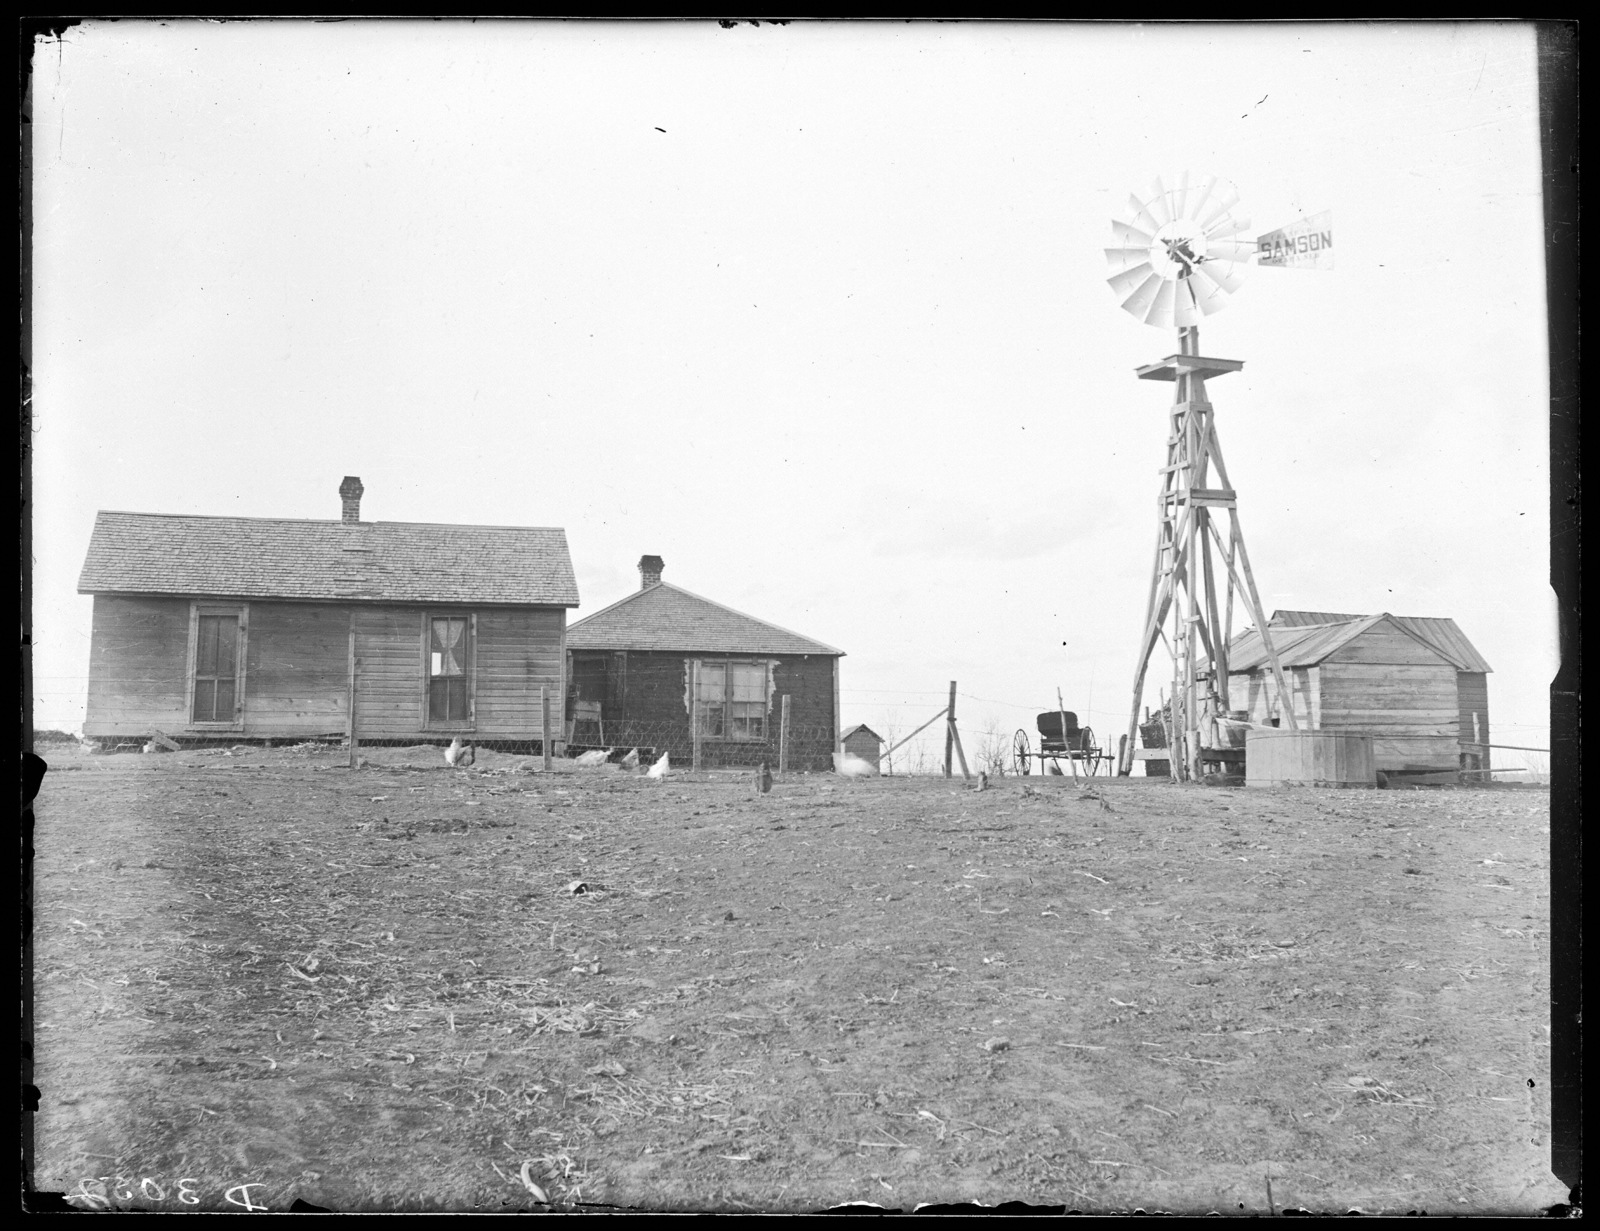 Farm scene in Buffalo County, Nebraska